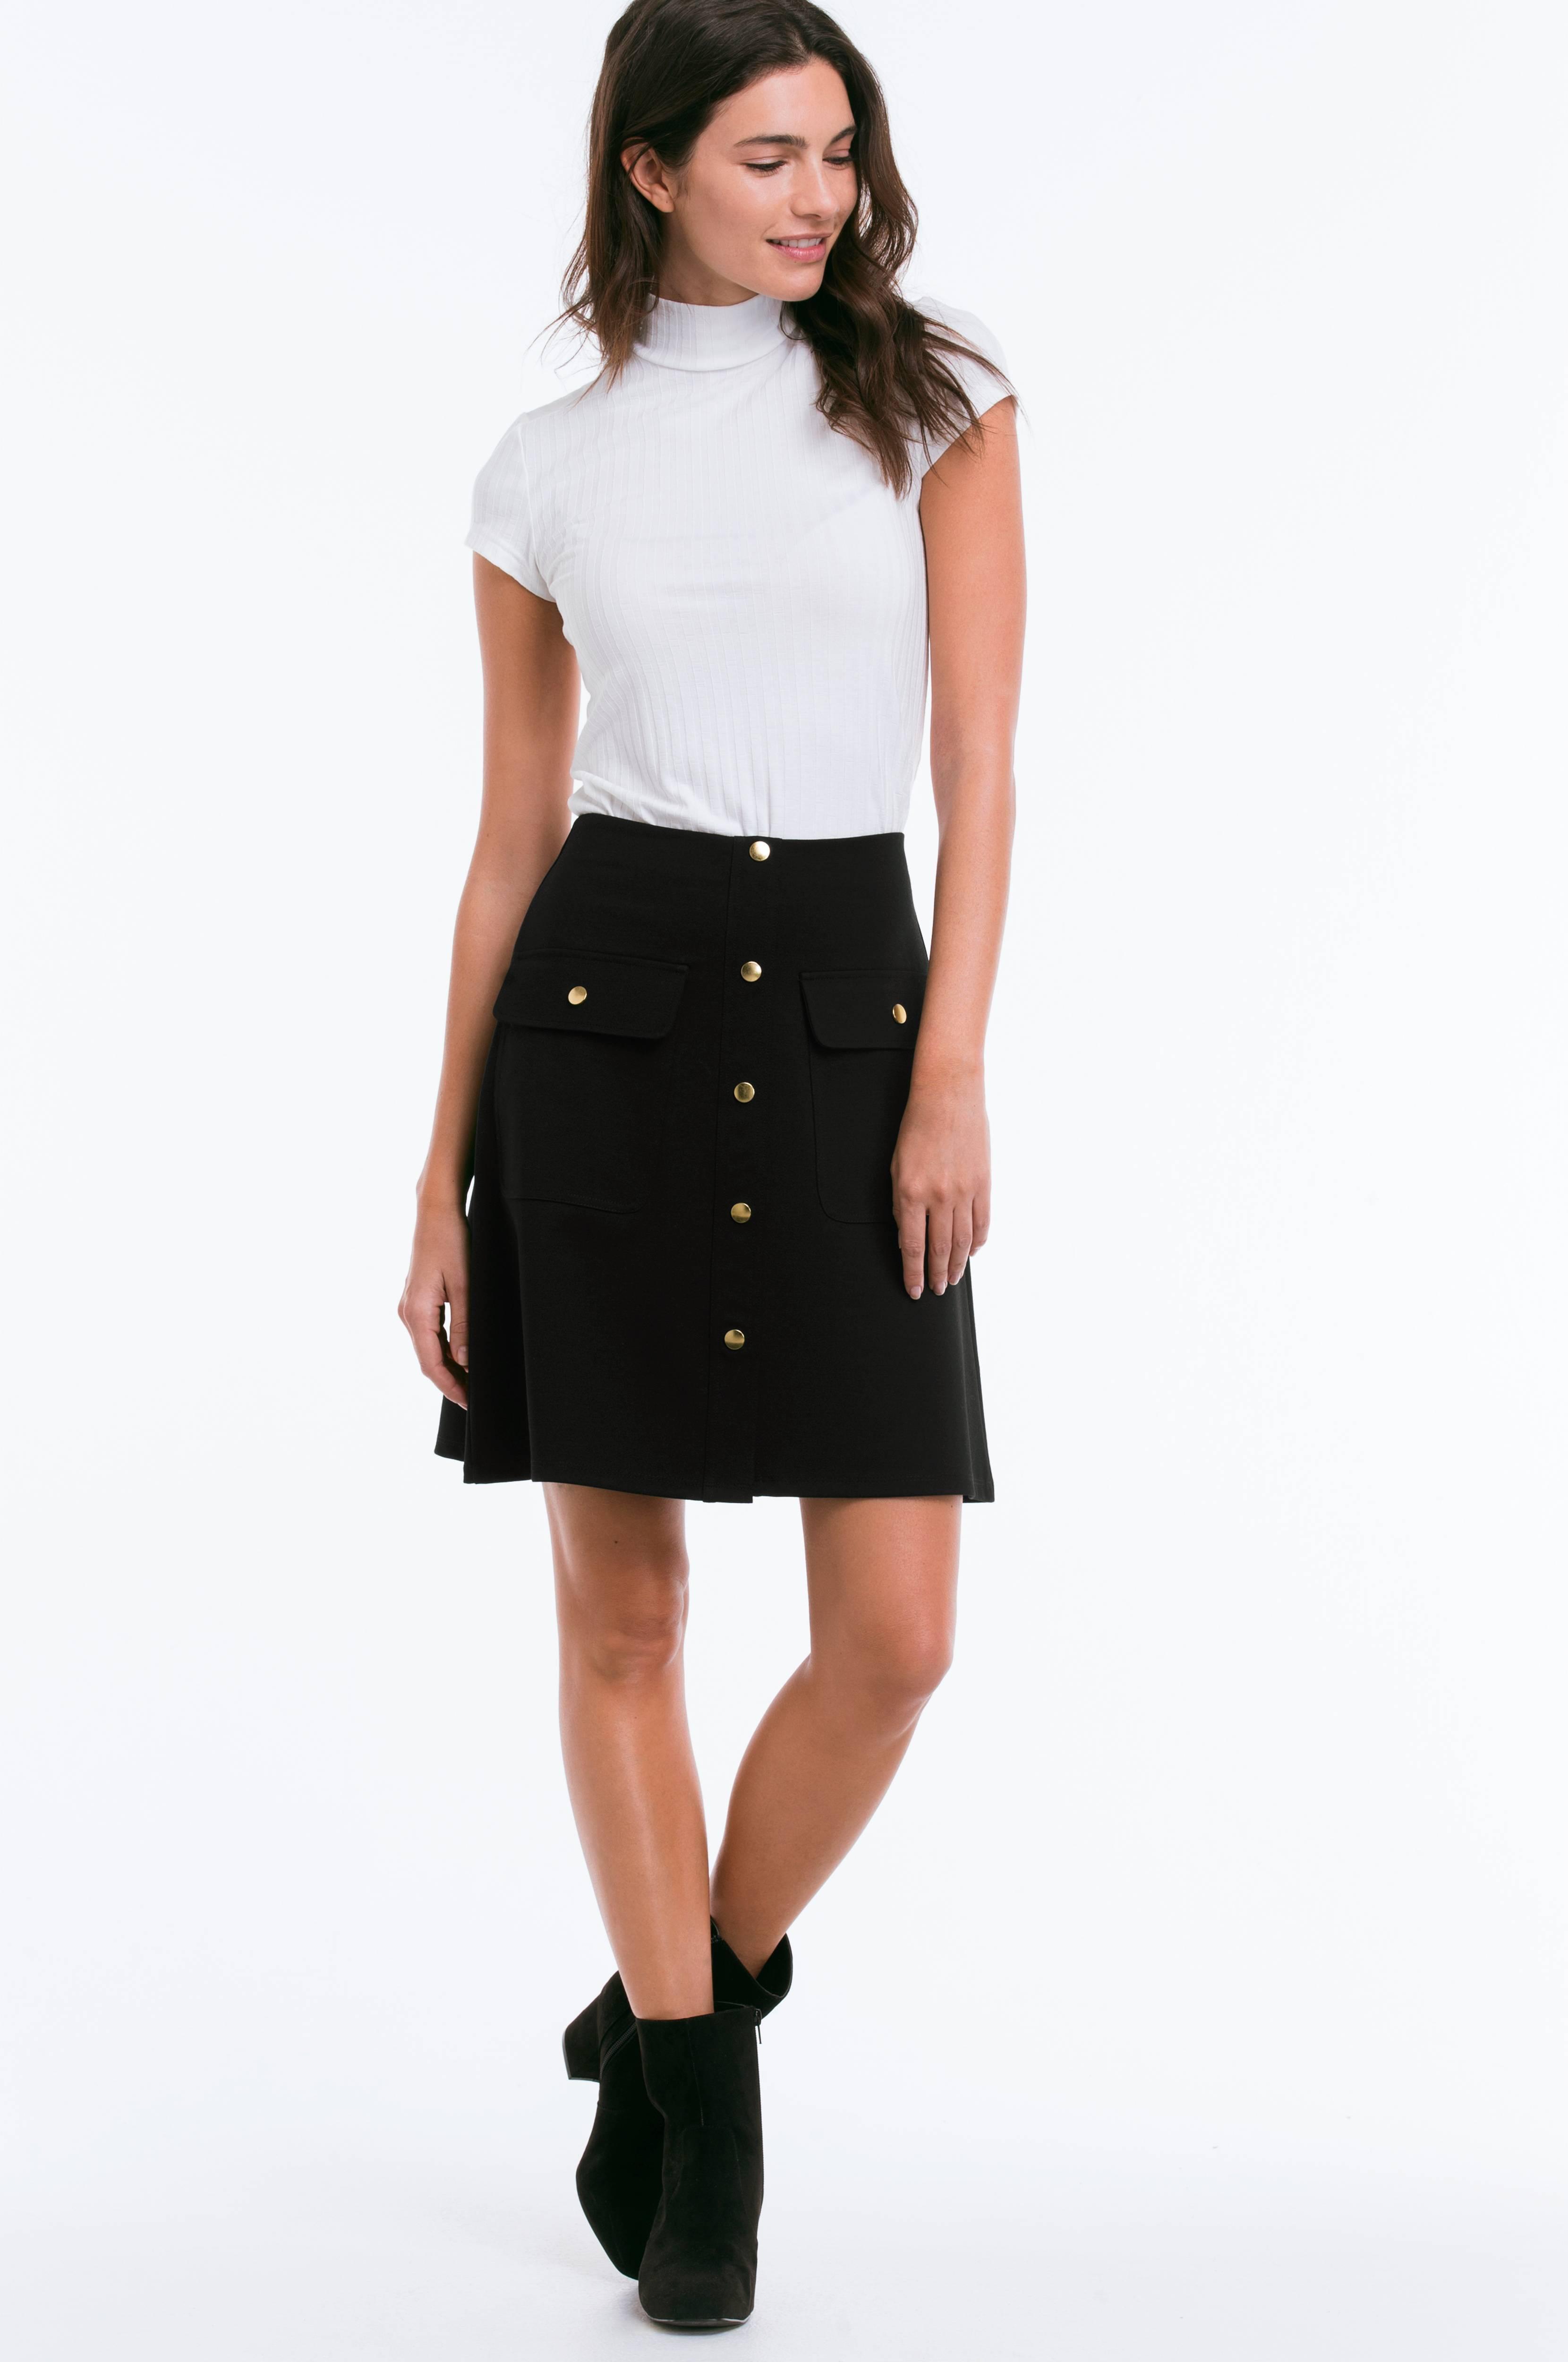 svart kjol med fickor